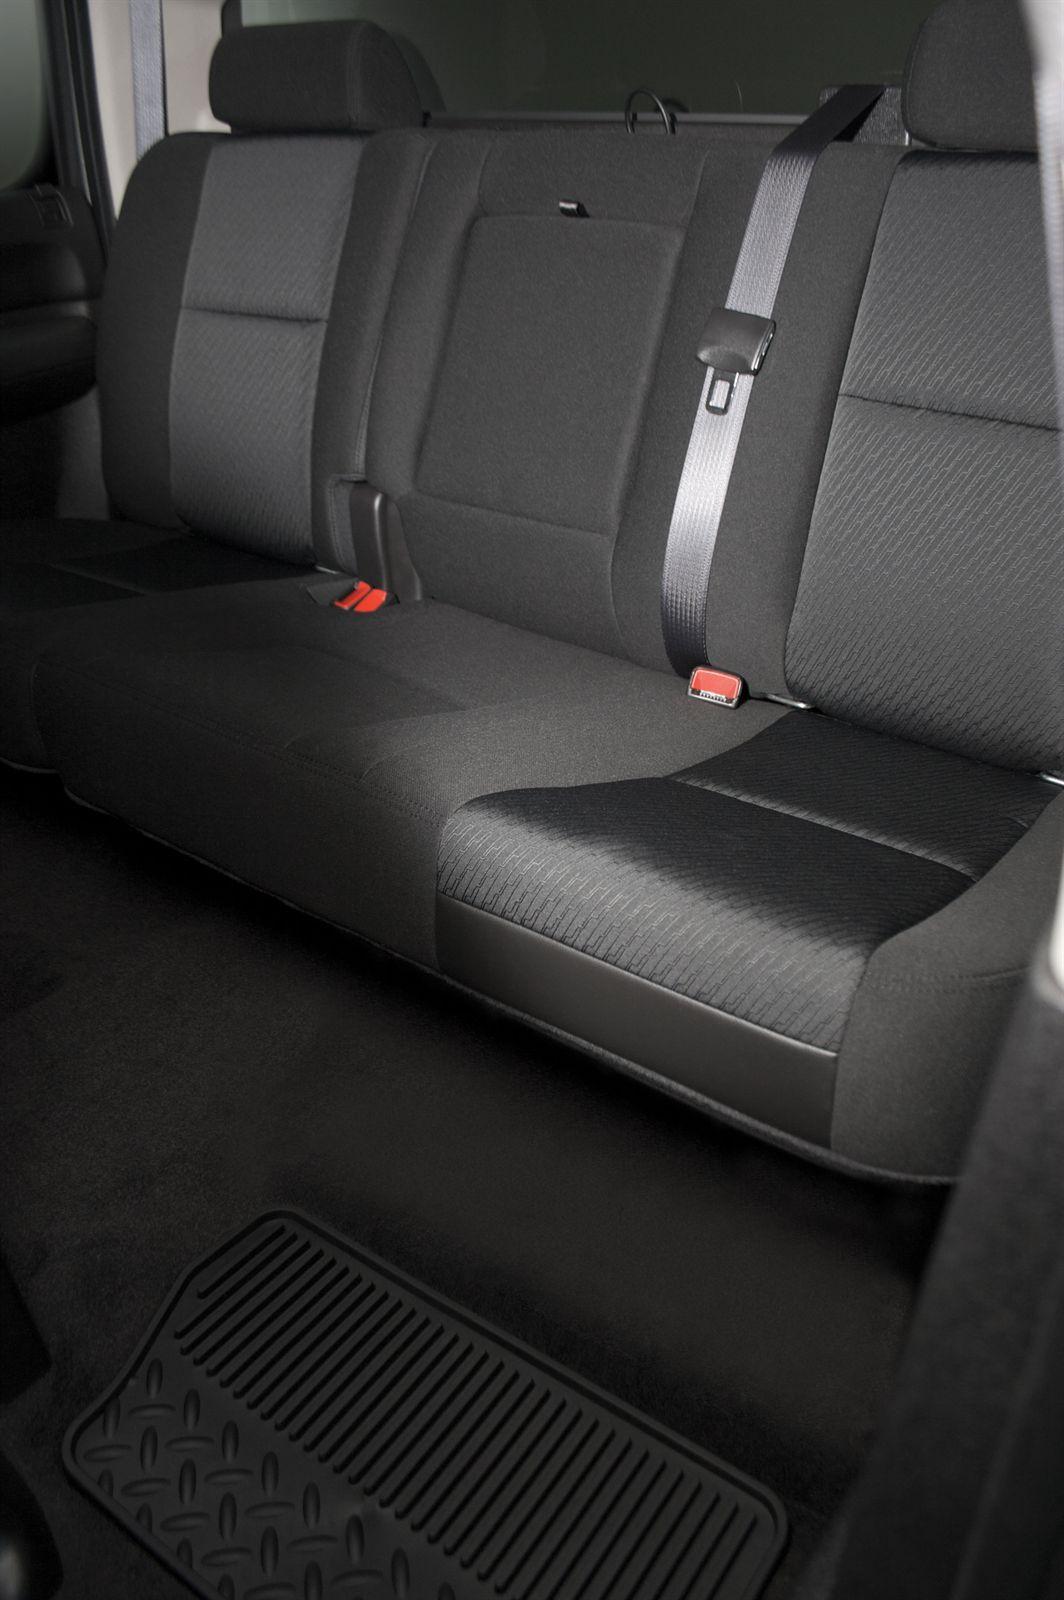 Chevrolet Silverado Crew Cab Loaded Inch W Rms Ohm Vehicle Specific Custom Subwoofer Enclosu